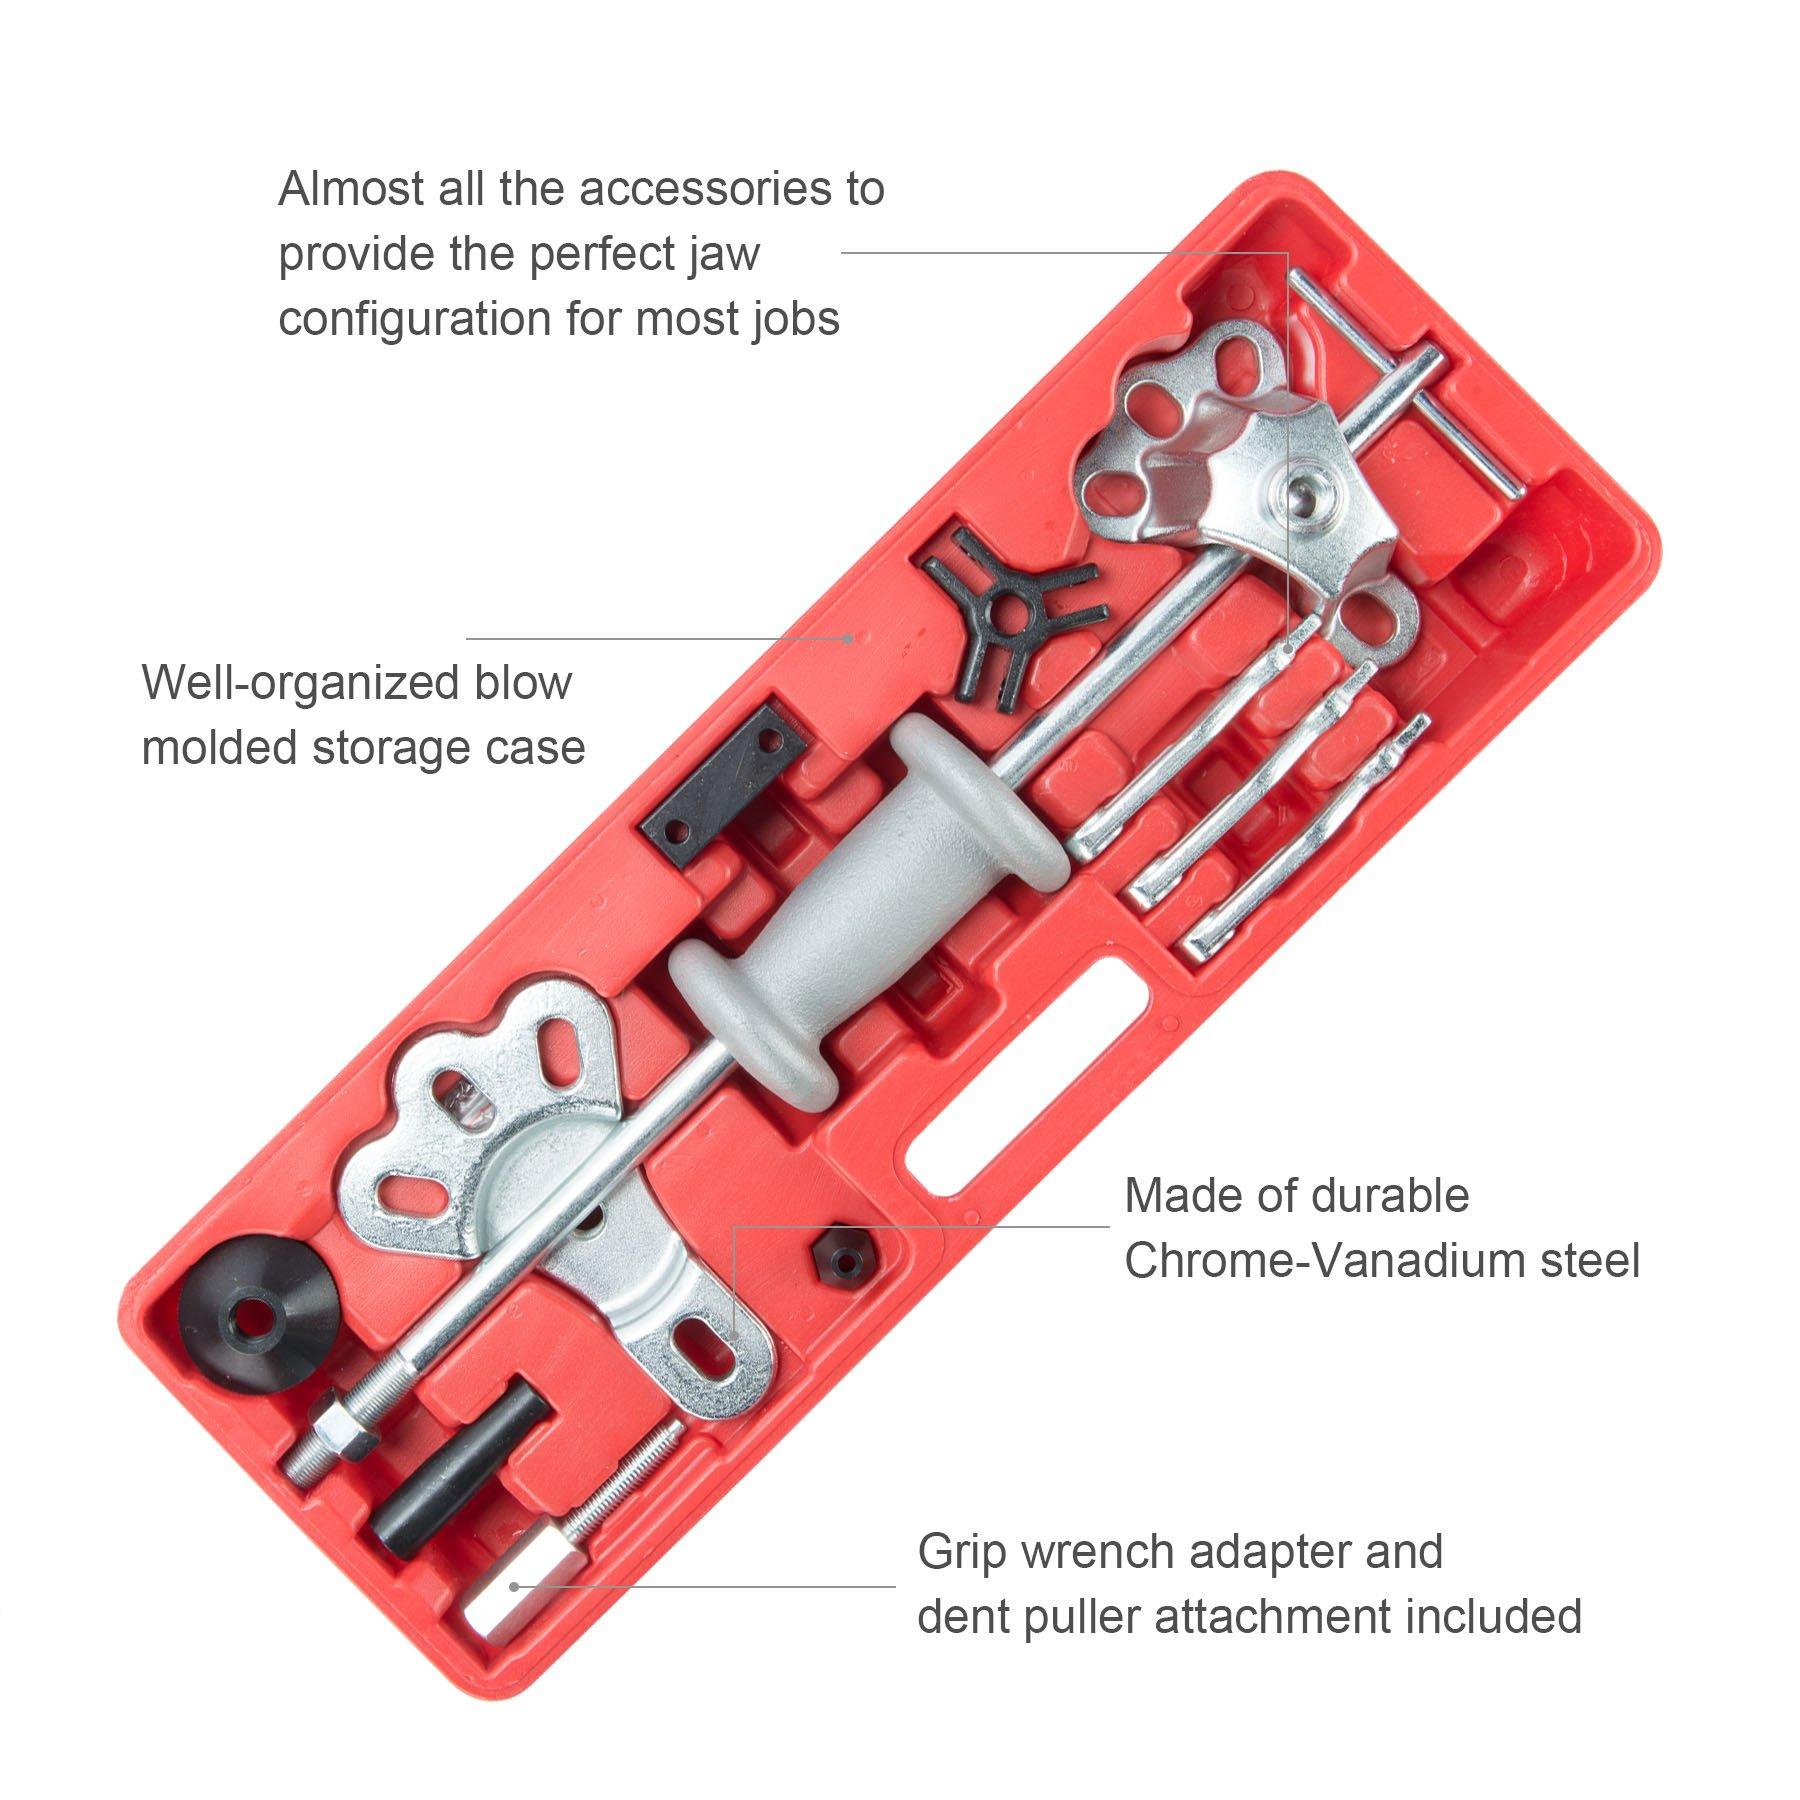 OrionMotorTech 9-Way Slide Hammer Puller Set, Front Wheel Hub Bearing Remover & Rear Wheel Axle Shaft Puller Tool Kit by OrionMotorTech (Image #2)